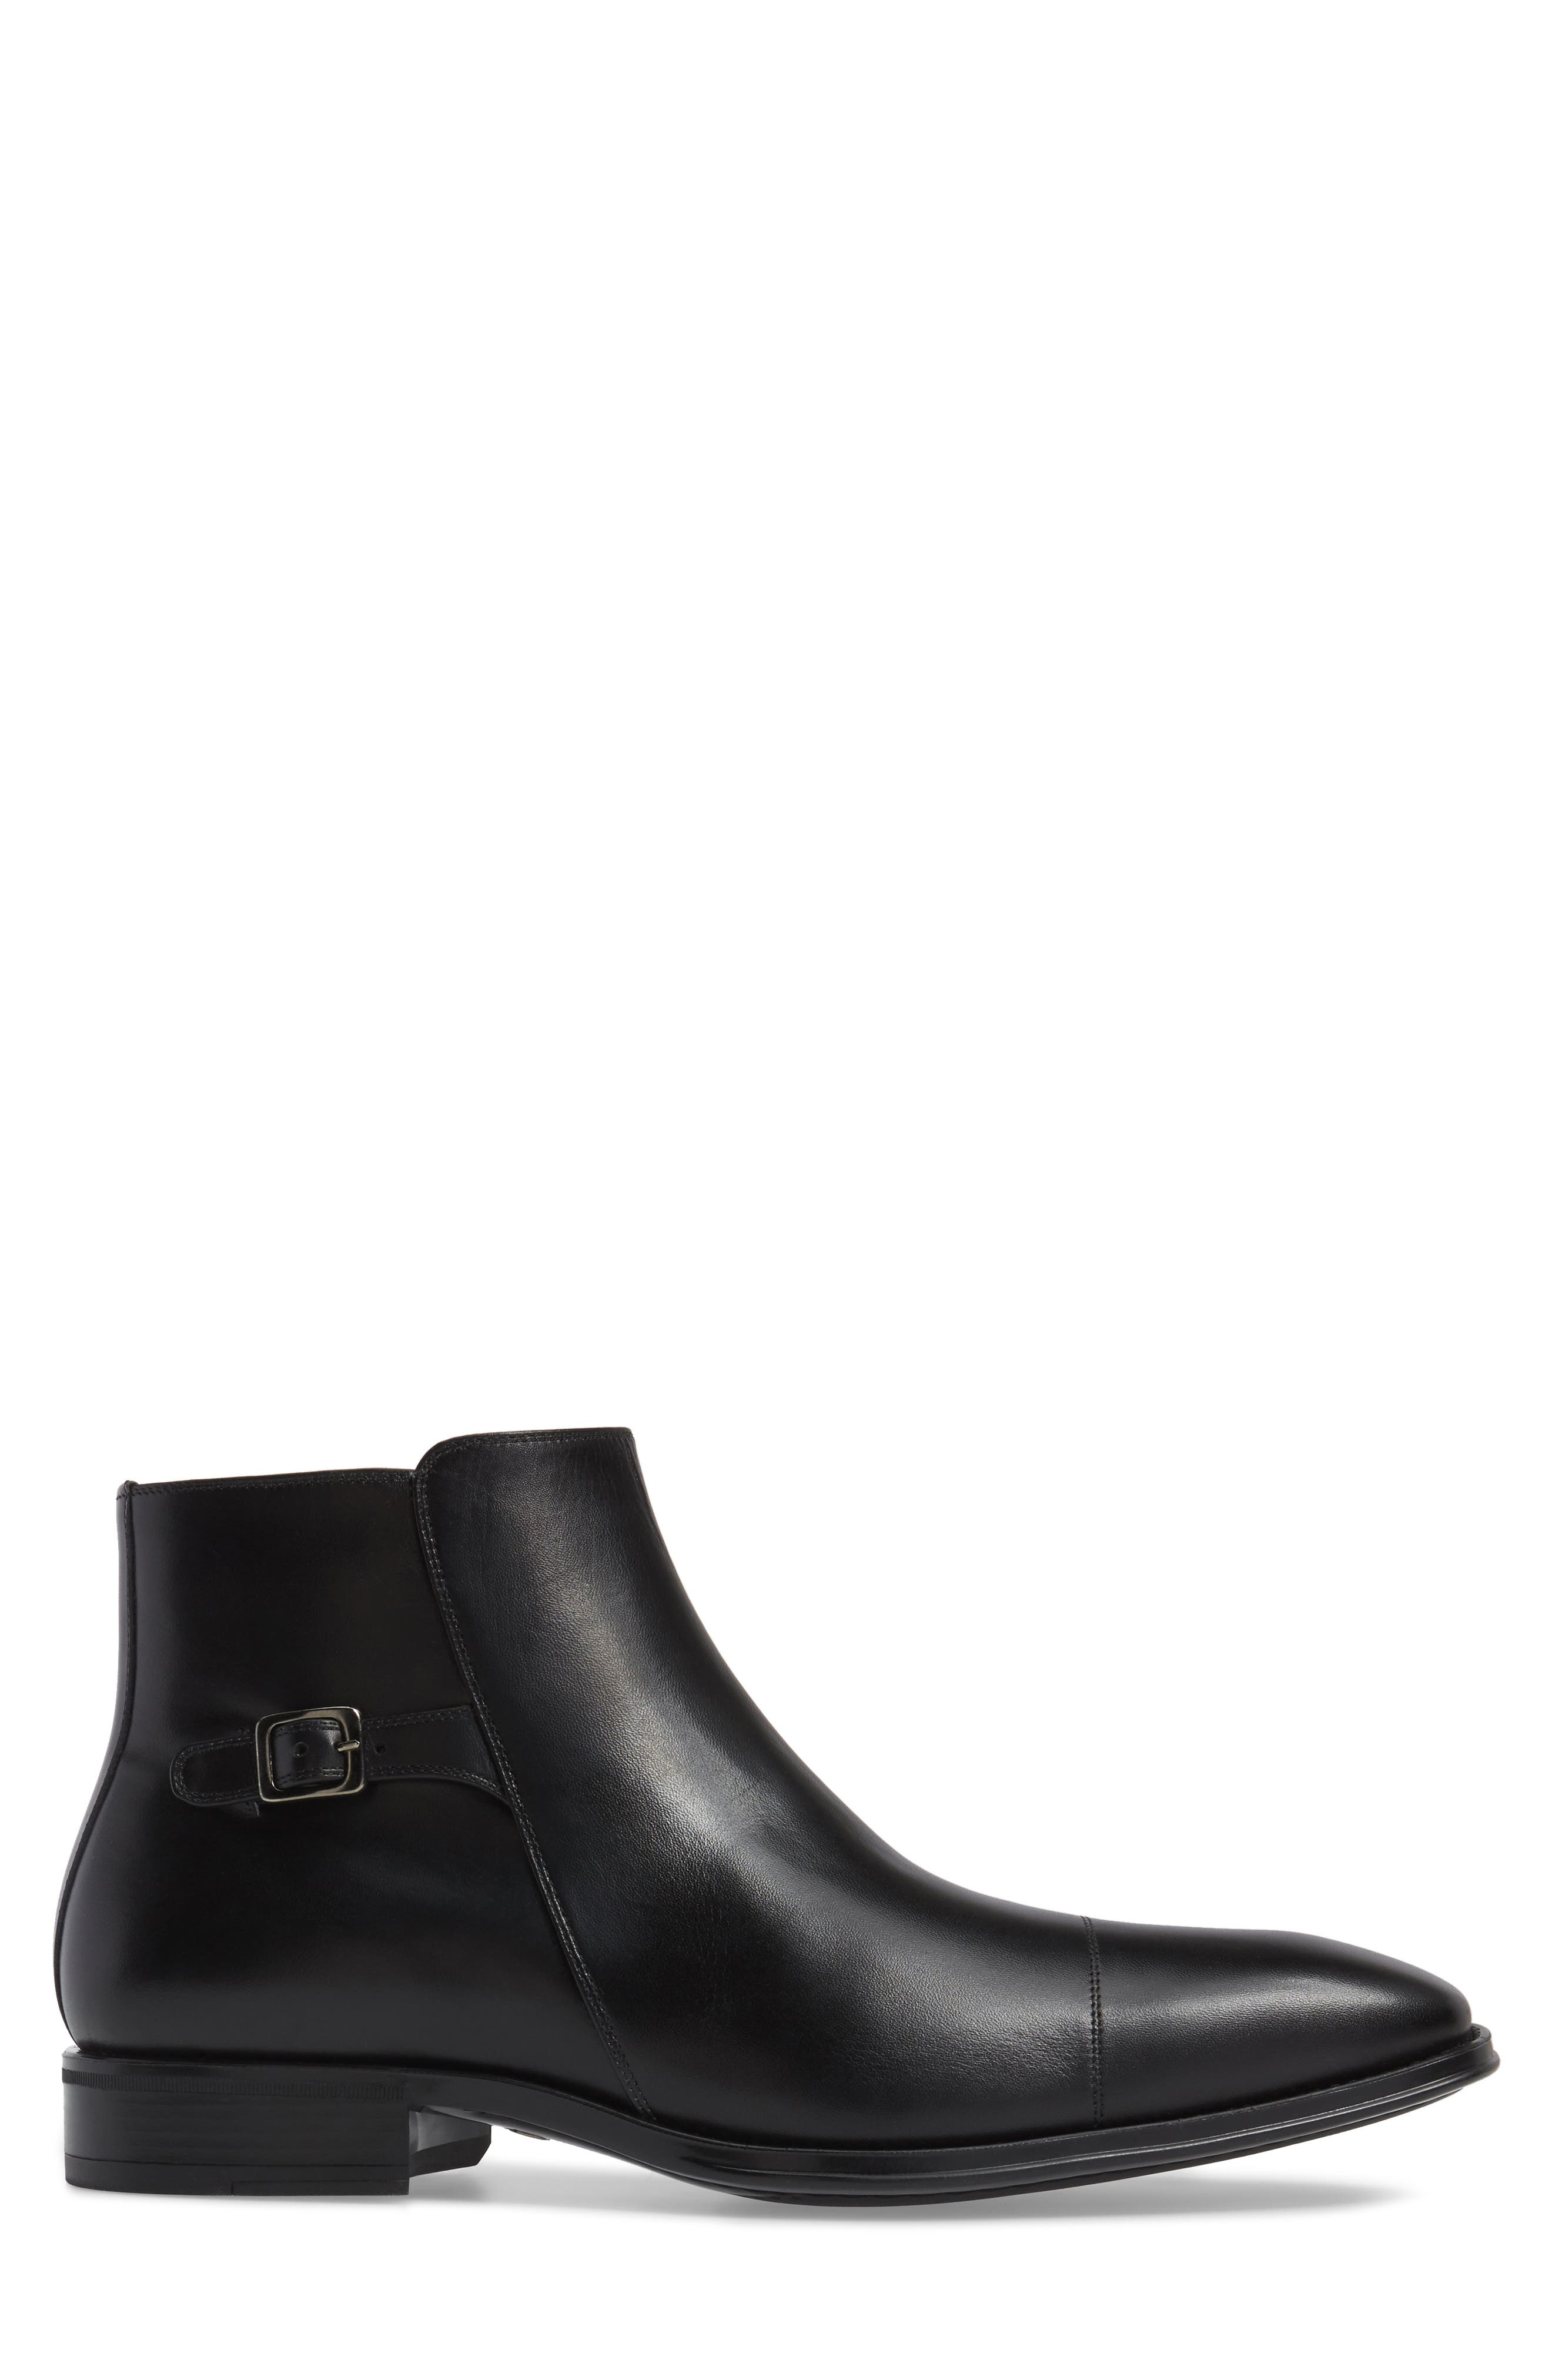 Casares II Zip Boot,                             Alternate thumbnail 3, color,                             Black